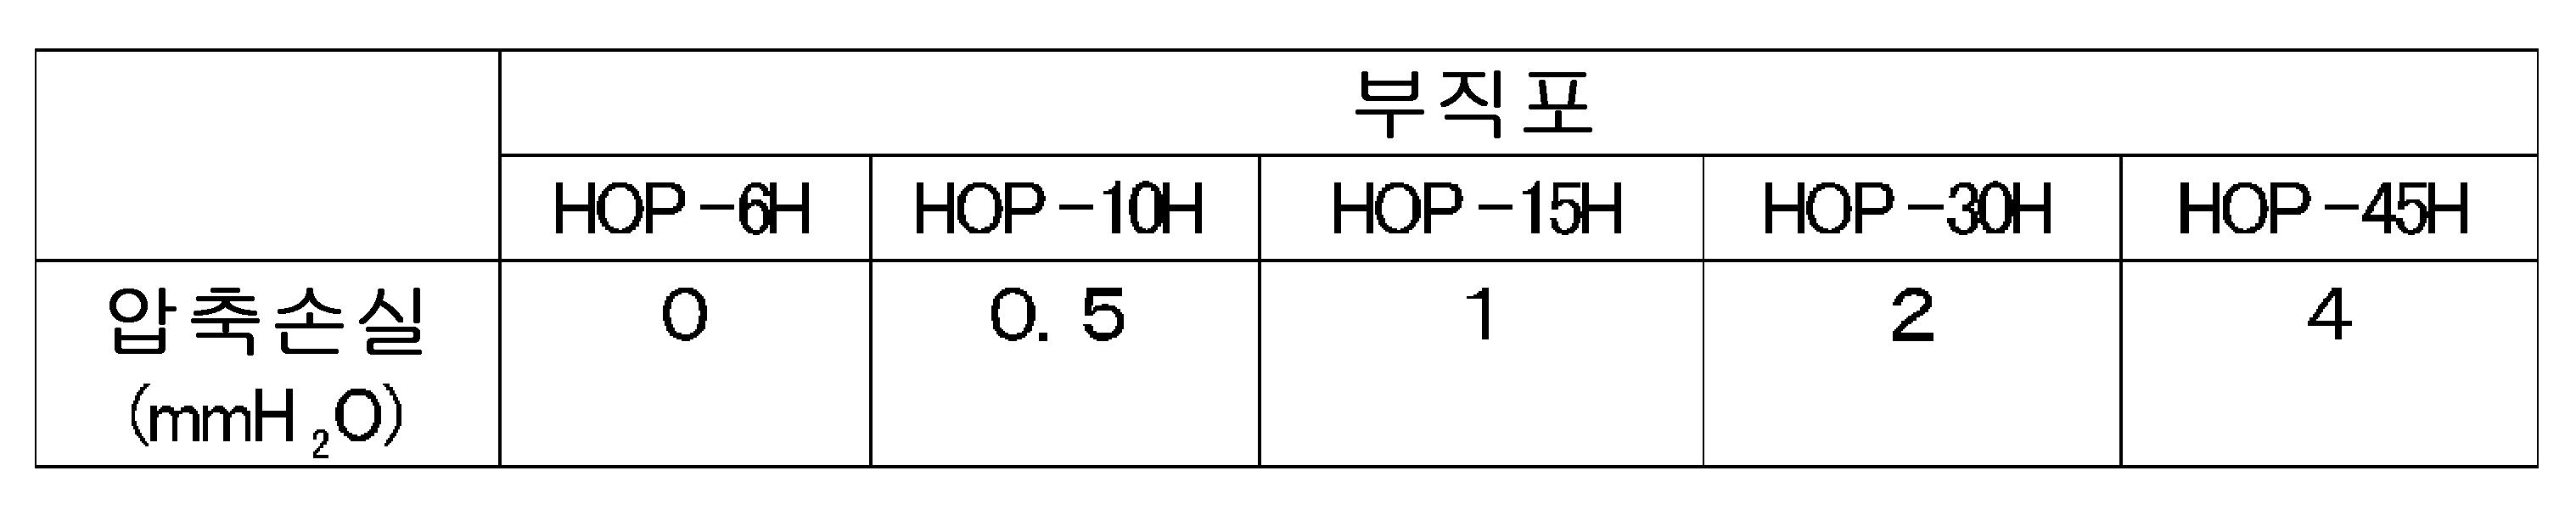 Figure 112013008922470-pct00006